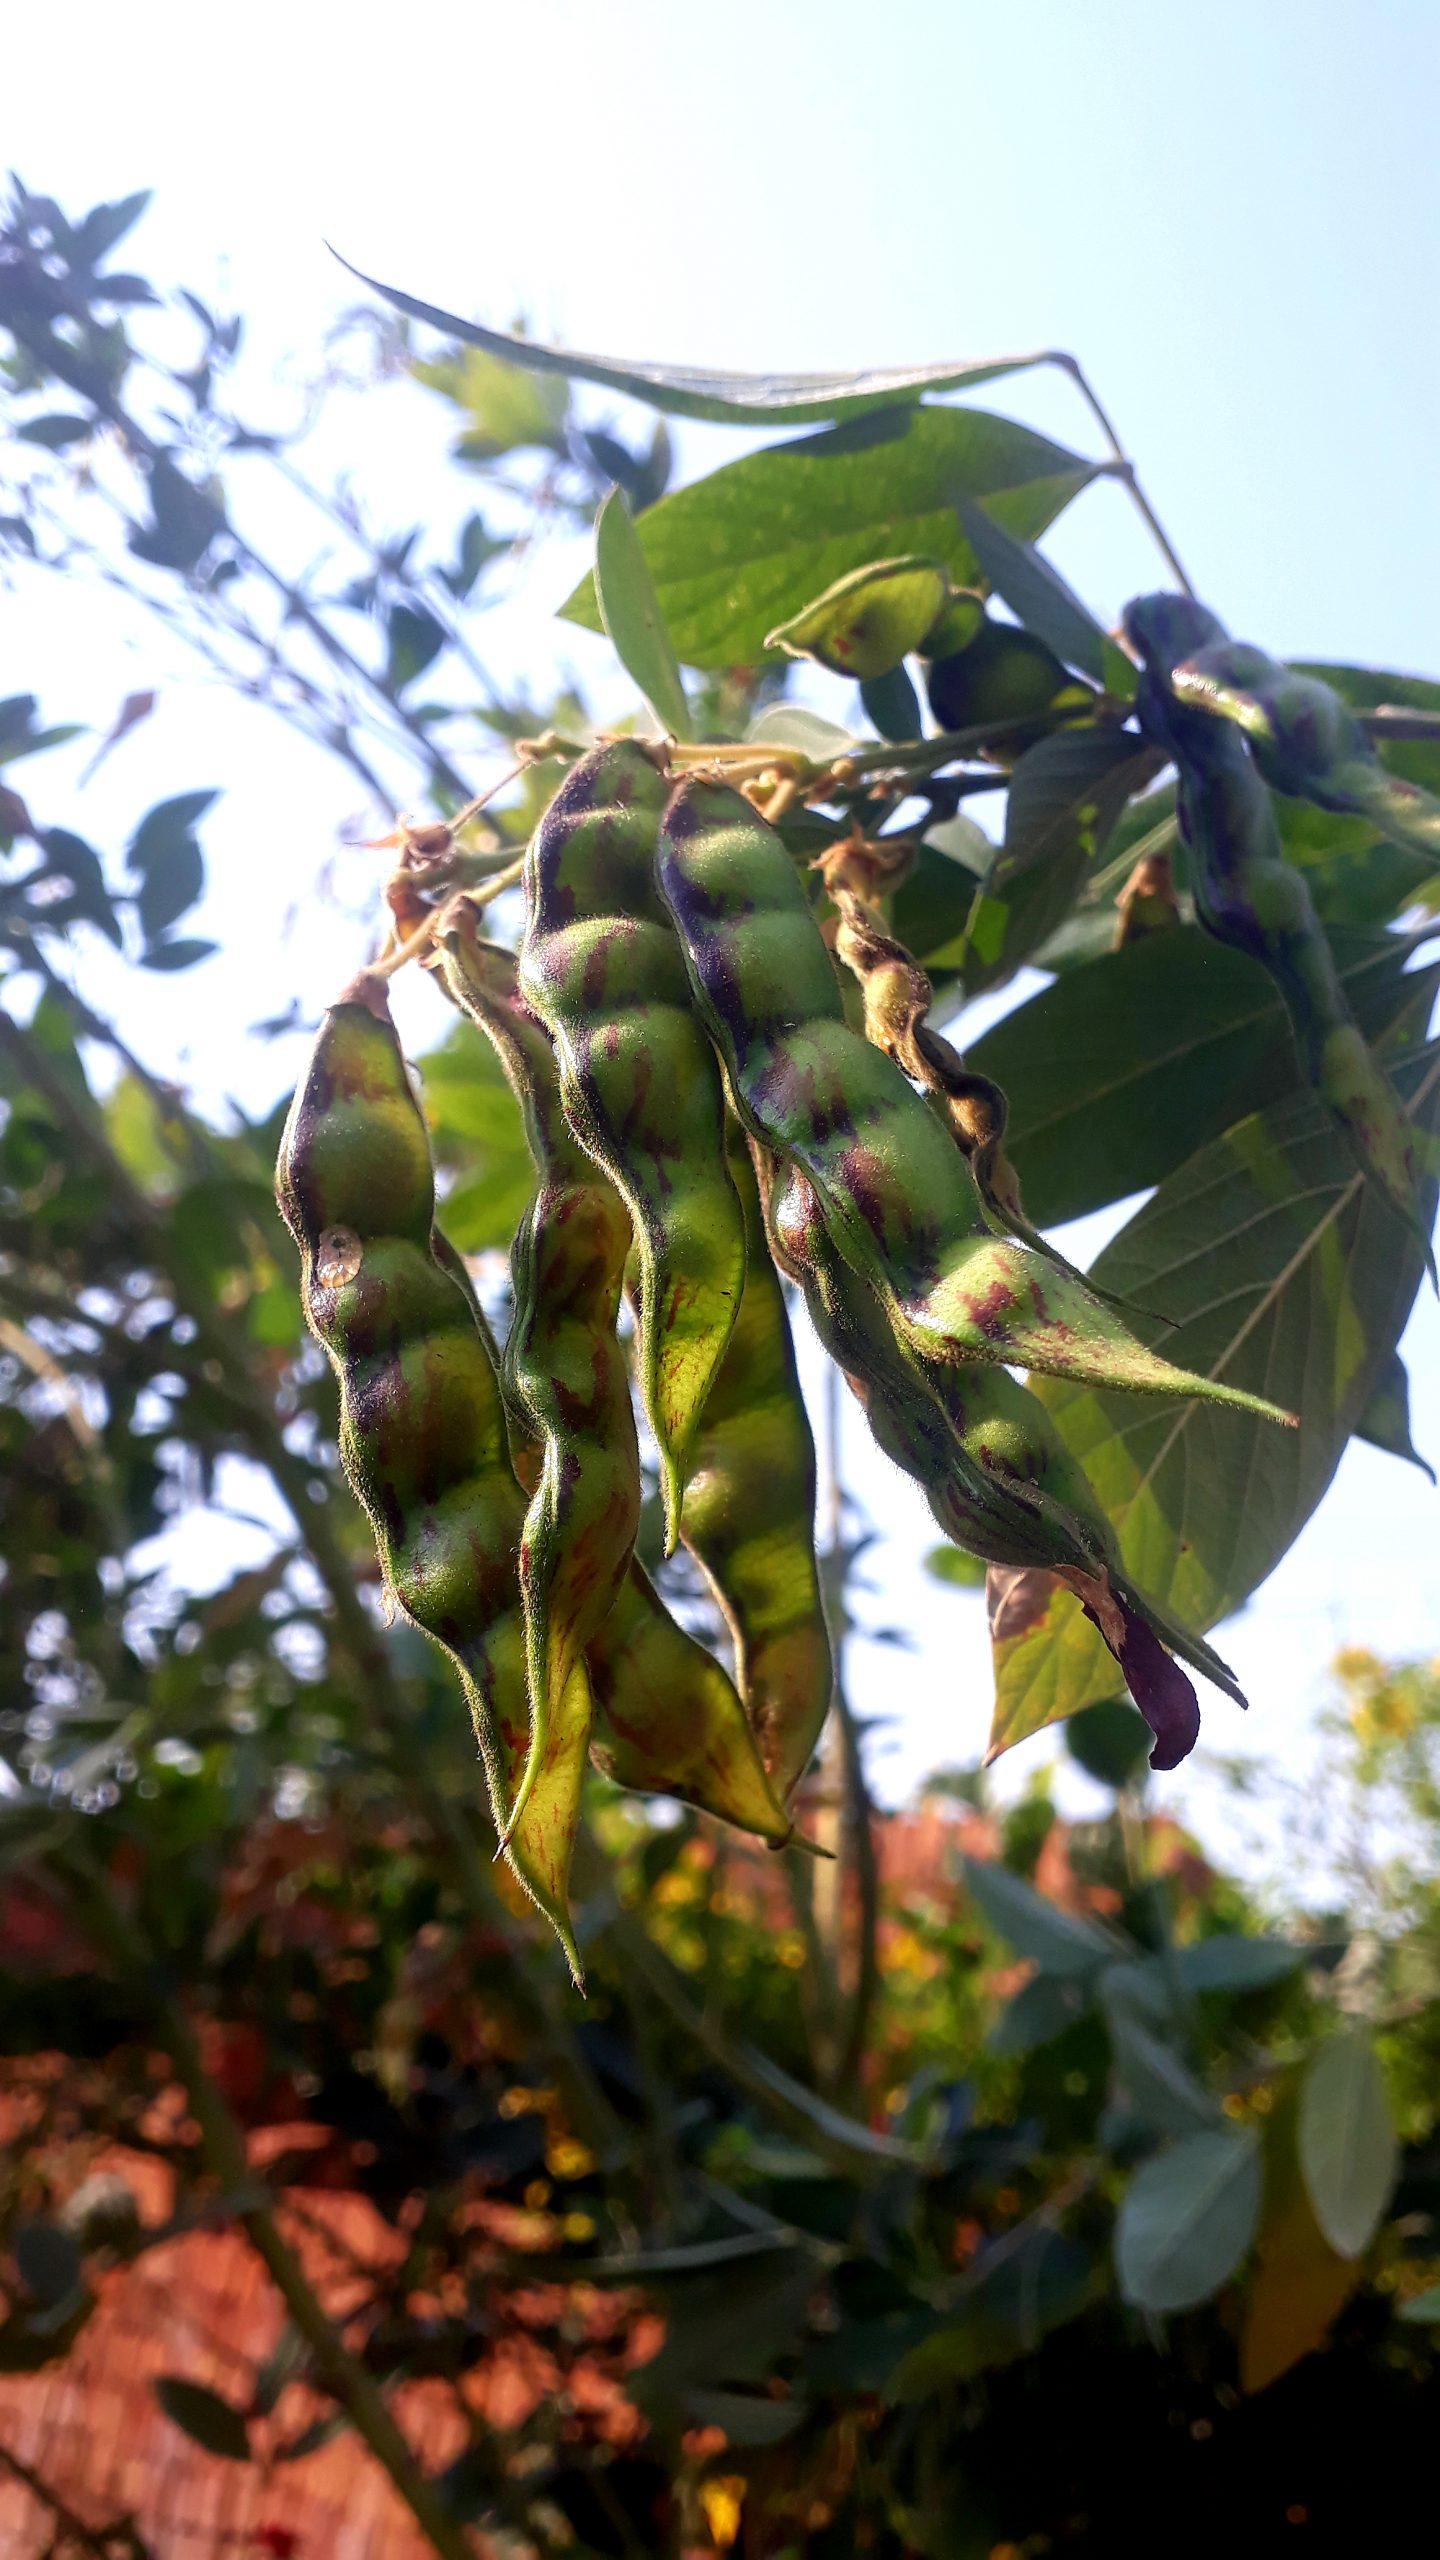 Beans on plant